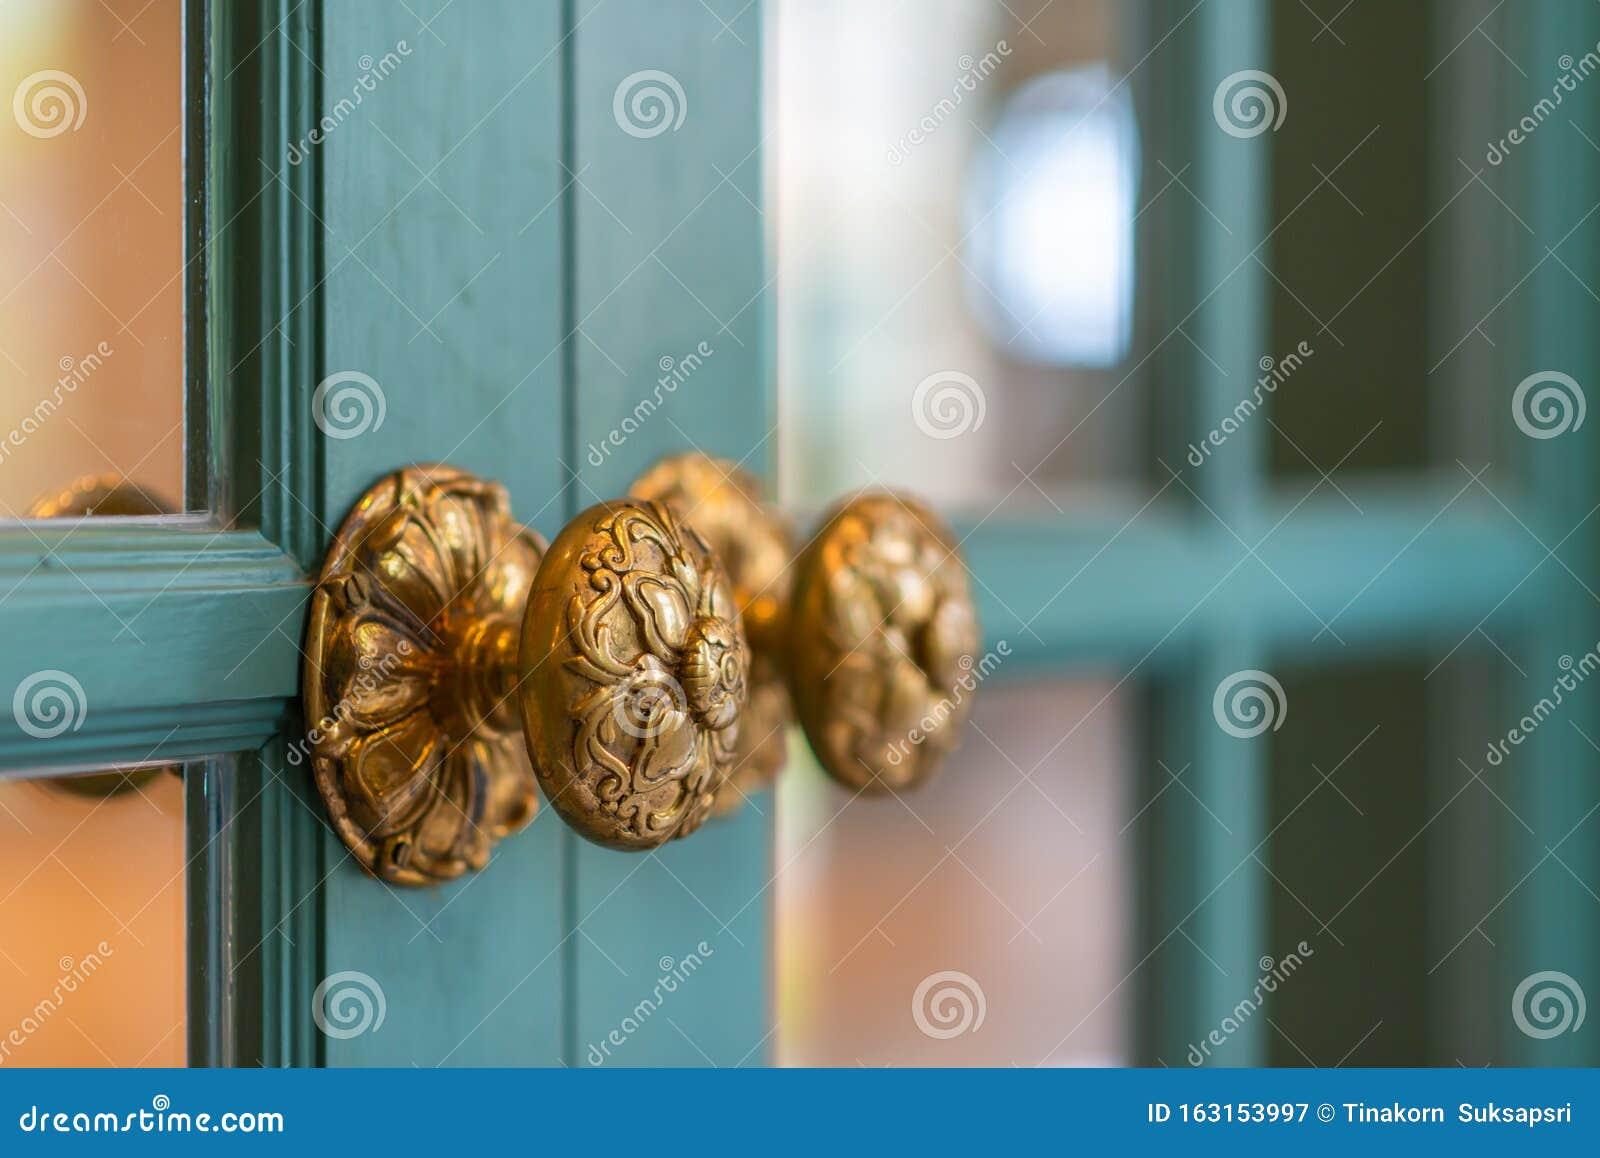 Classic Retro Brass Door Knob Vintage Decoration Retro Interior Stock Image Image Of Doorway Classic 163153997